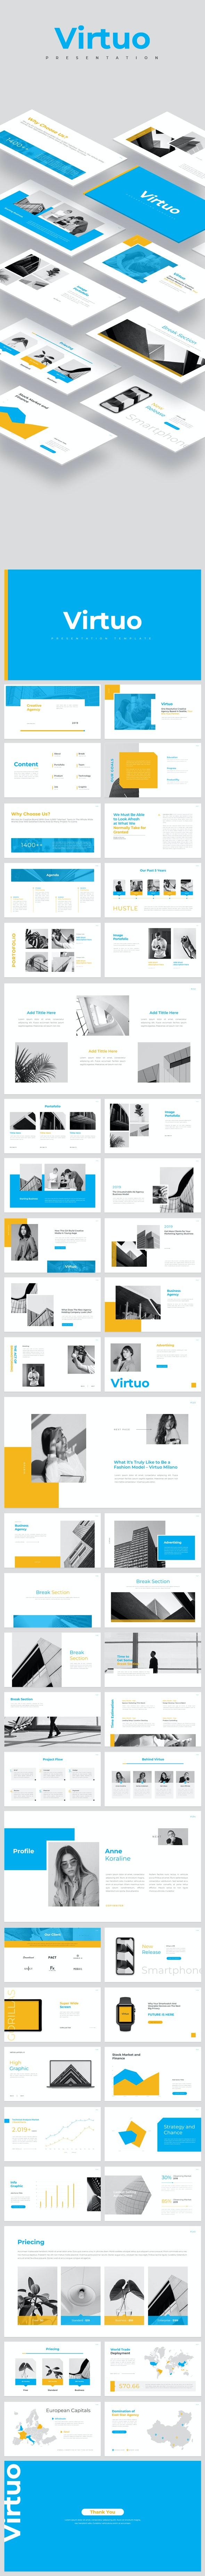 Virtuo Powerpoint - Presentation Templates